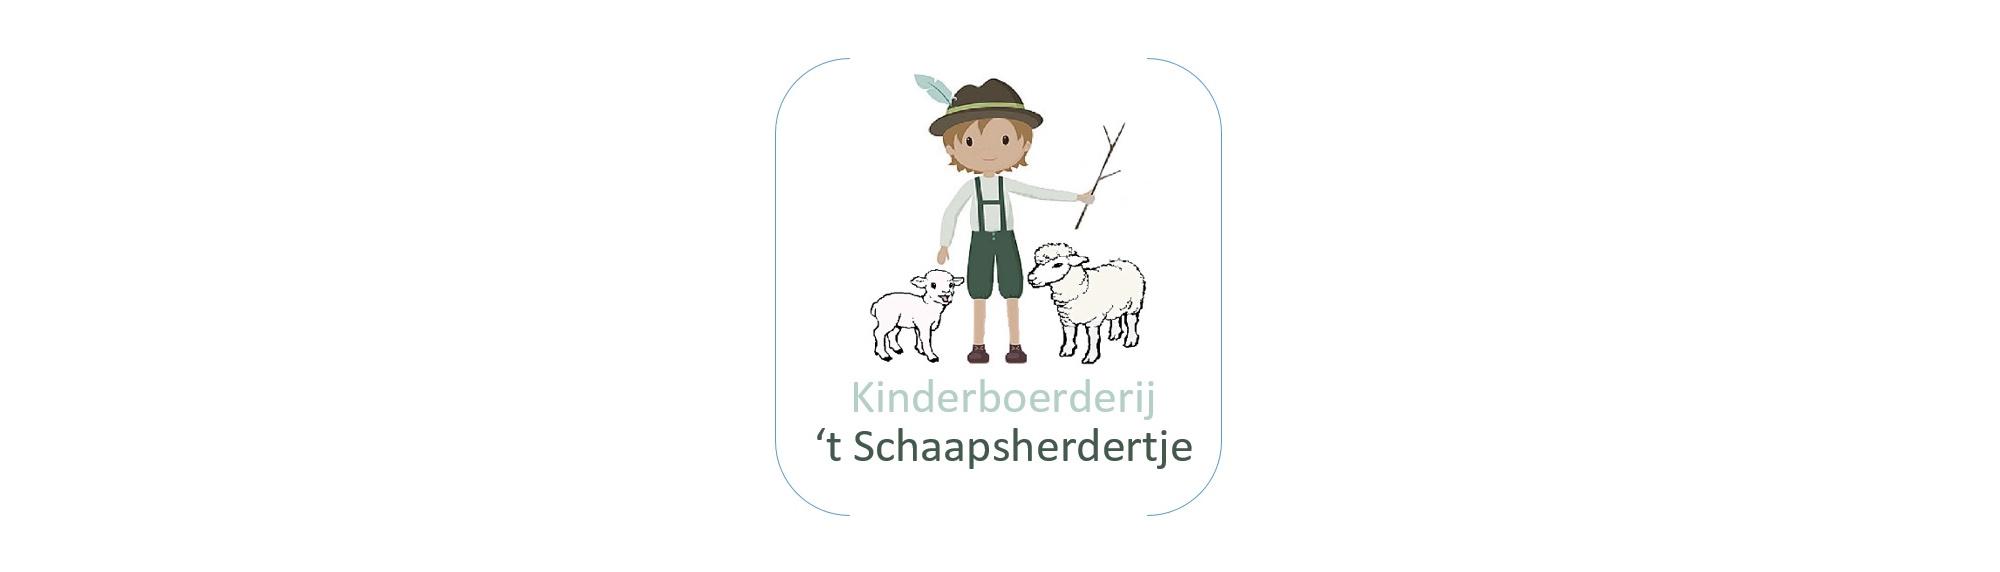 https://zonneflex.nl/wp-content/uploads/2020/02/Logo-Kinderboerderij-breed.jpg